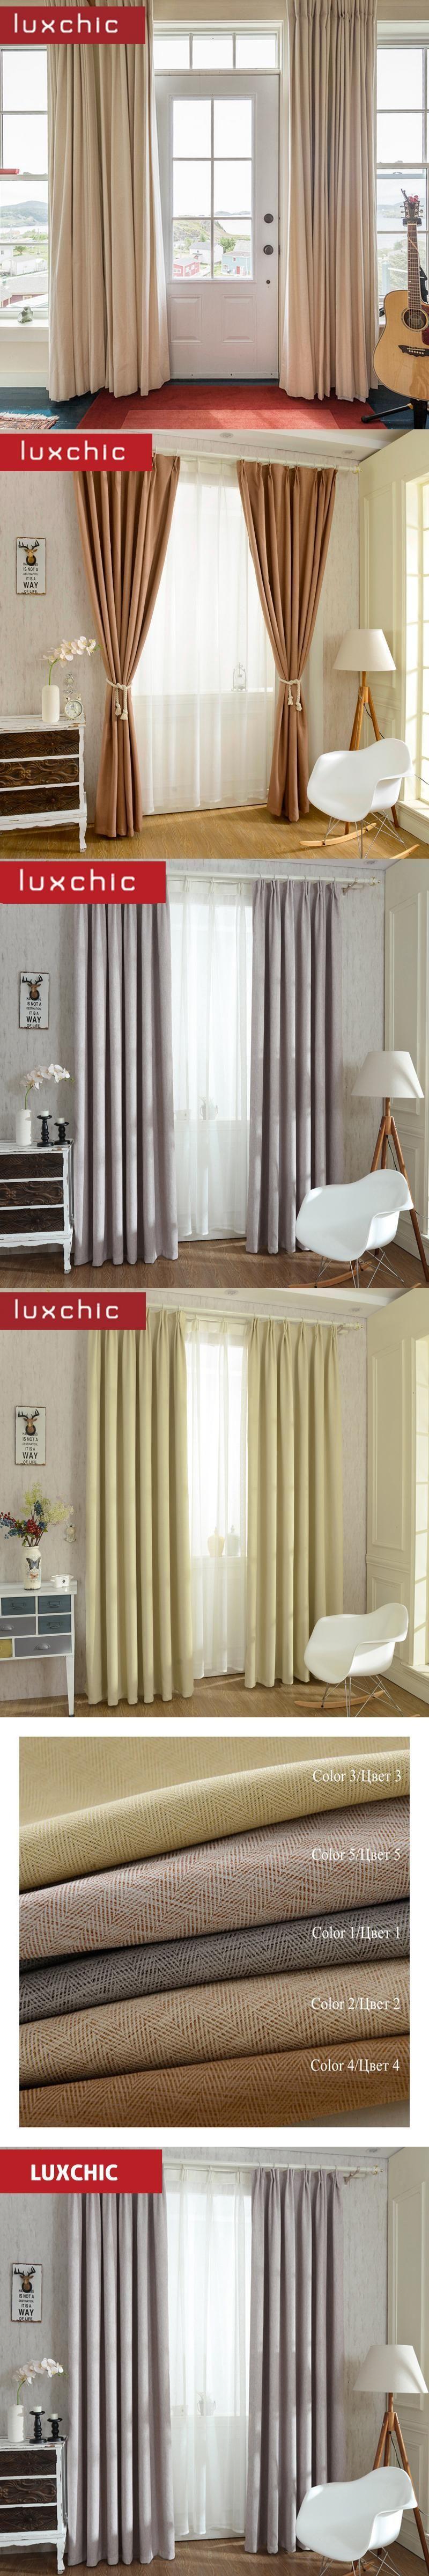 2 window bedroom ideas  best blackout curtains for childrenus rooms u room darkening ideas